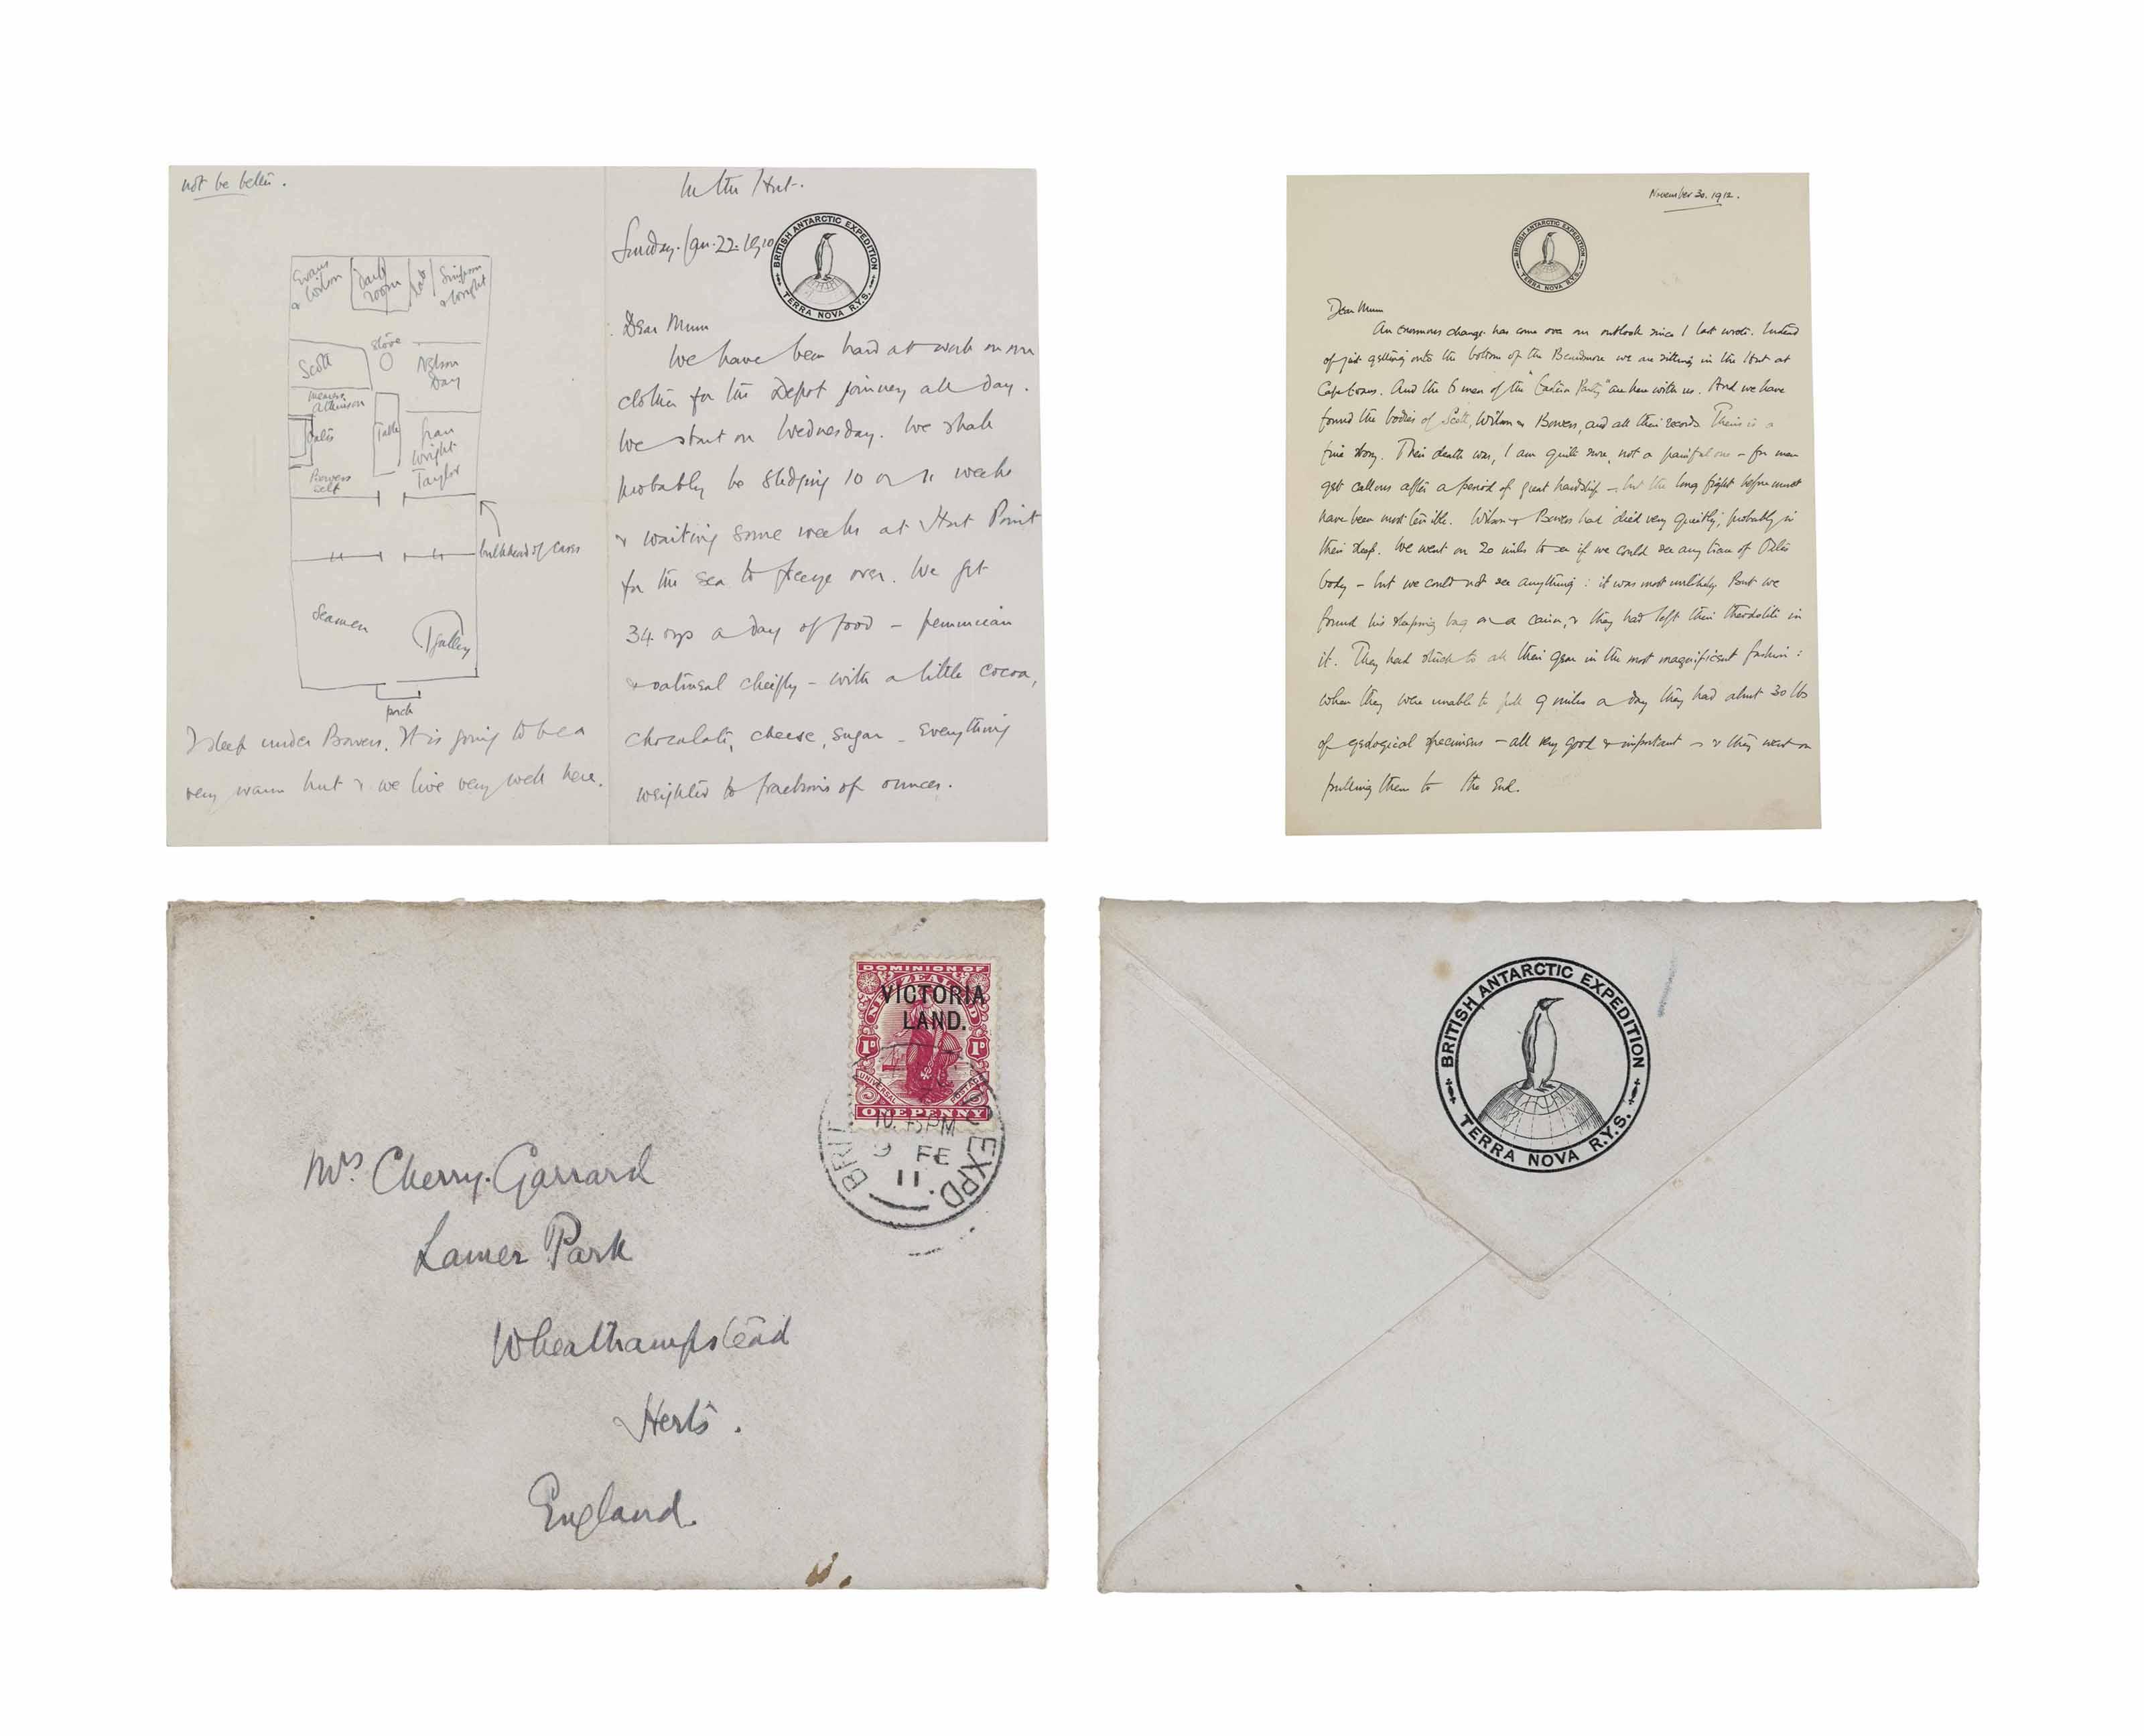 BRITISH ANTARCTIC EXPEDITION, 1910-1913 -- APSLEY GEORGE BENET CHERRY-GARRARD (1886-1959)